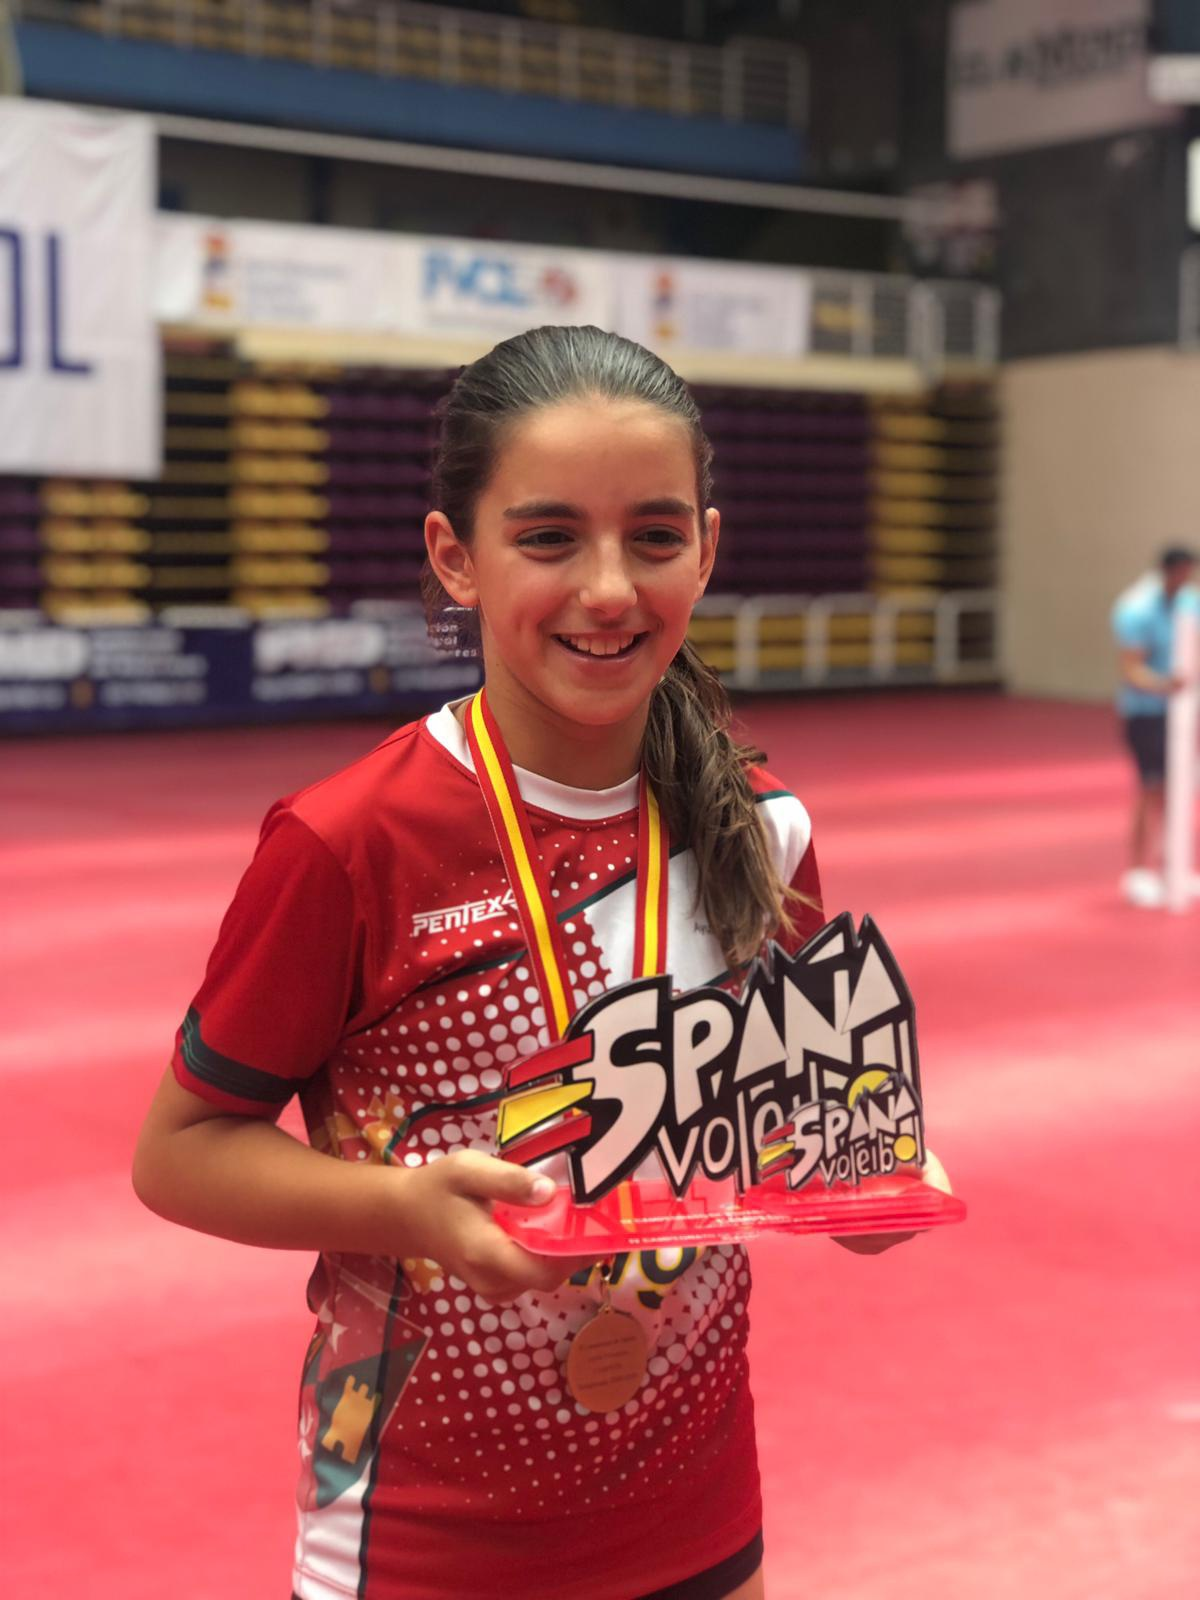 SARA GONZÁLEZ MORALES CAMPEONA DE ESPAÑA DE VOLEIBOL